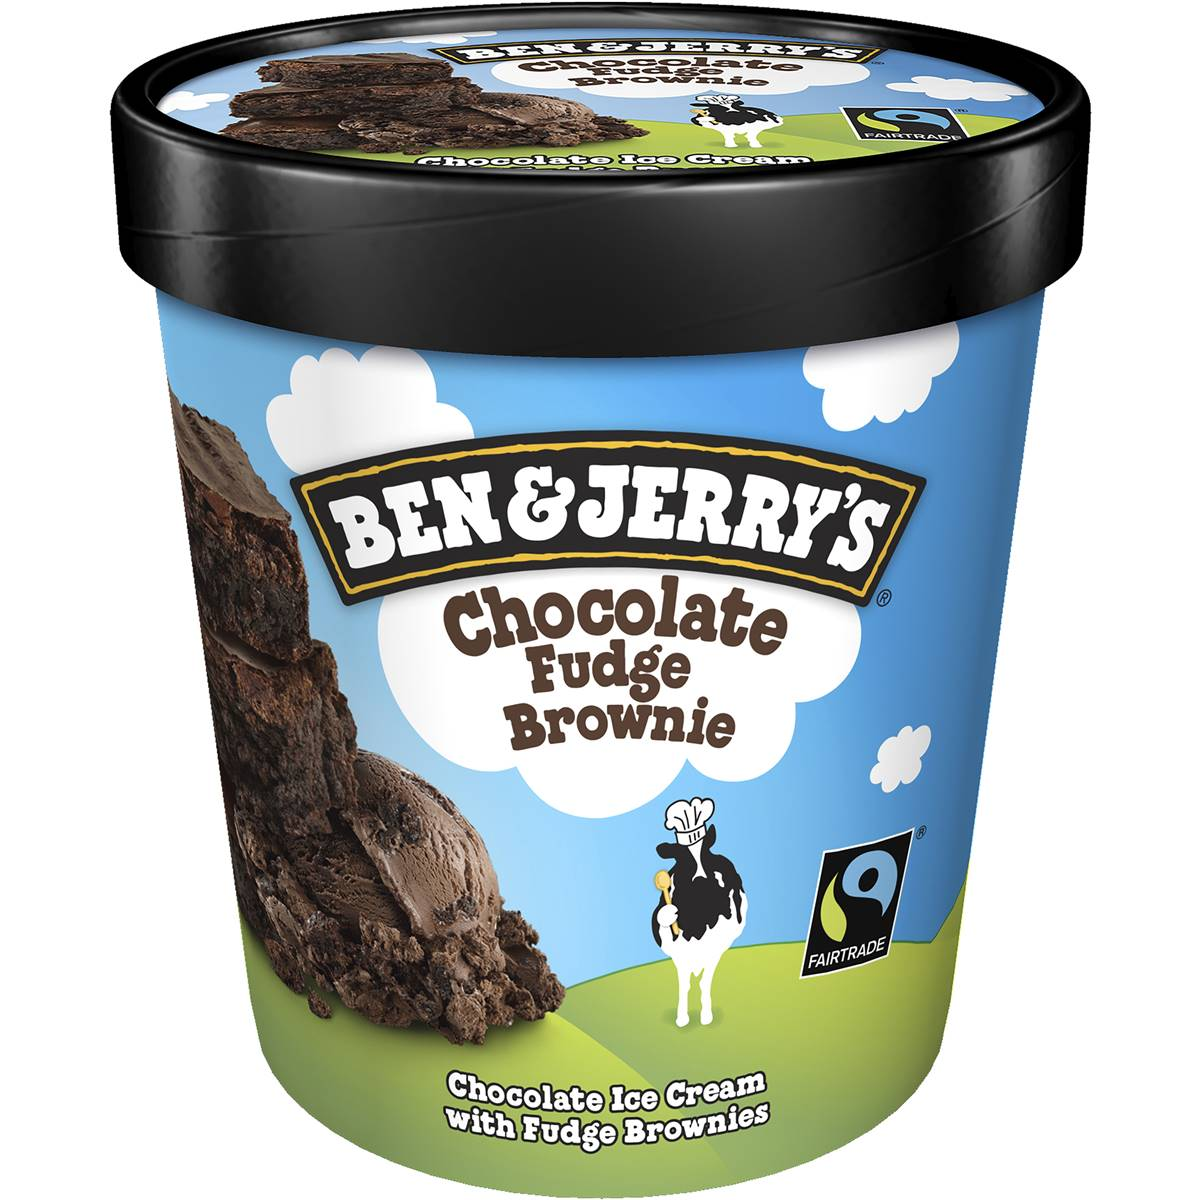 Ben & Jerry's Ice Cream Chocolate Fudge Brownie